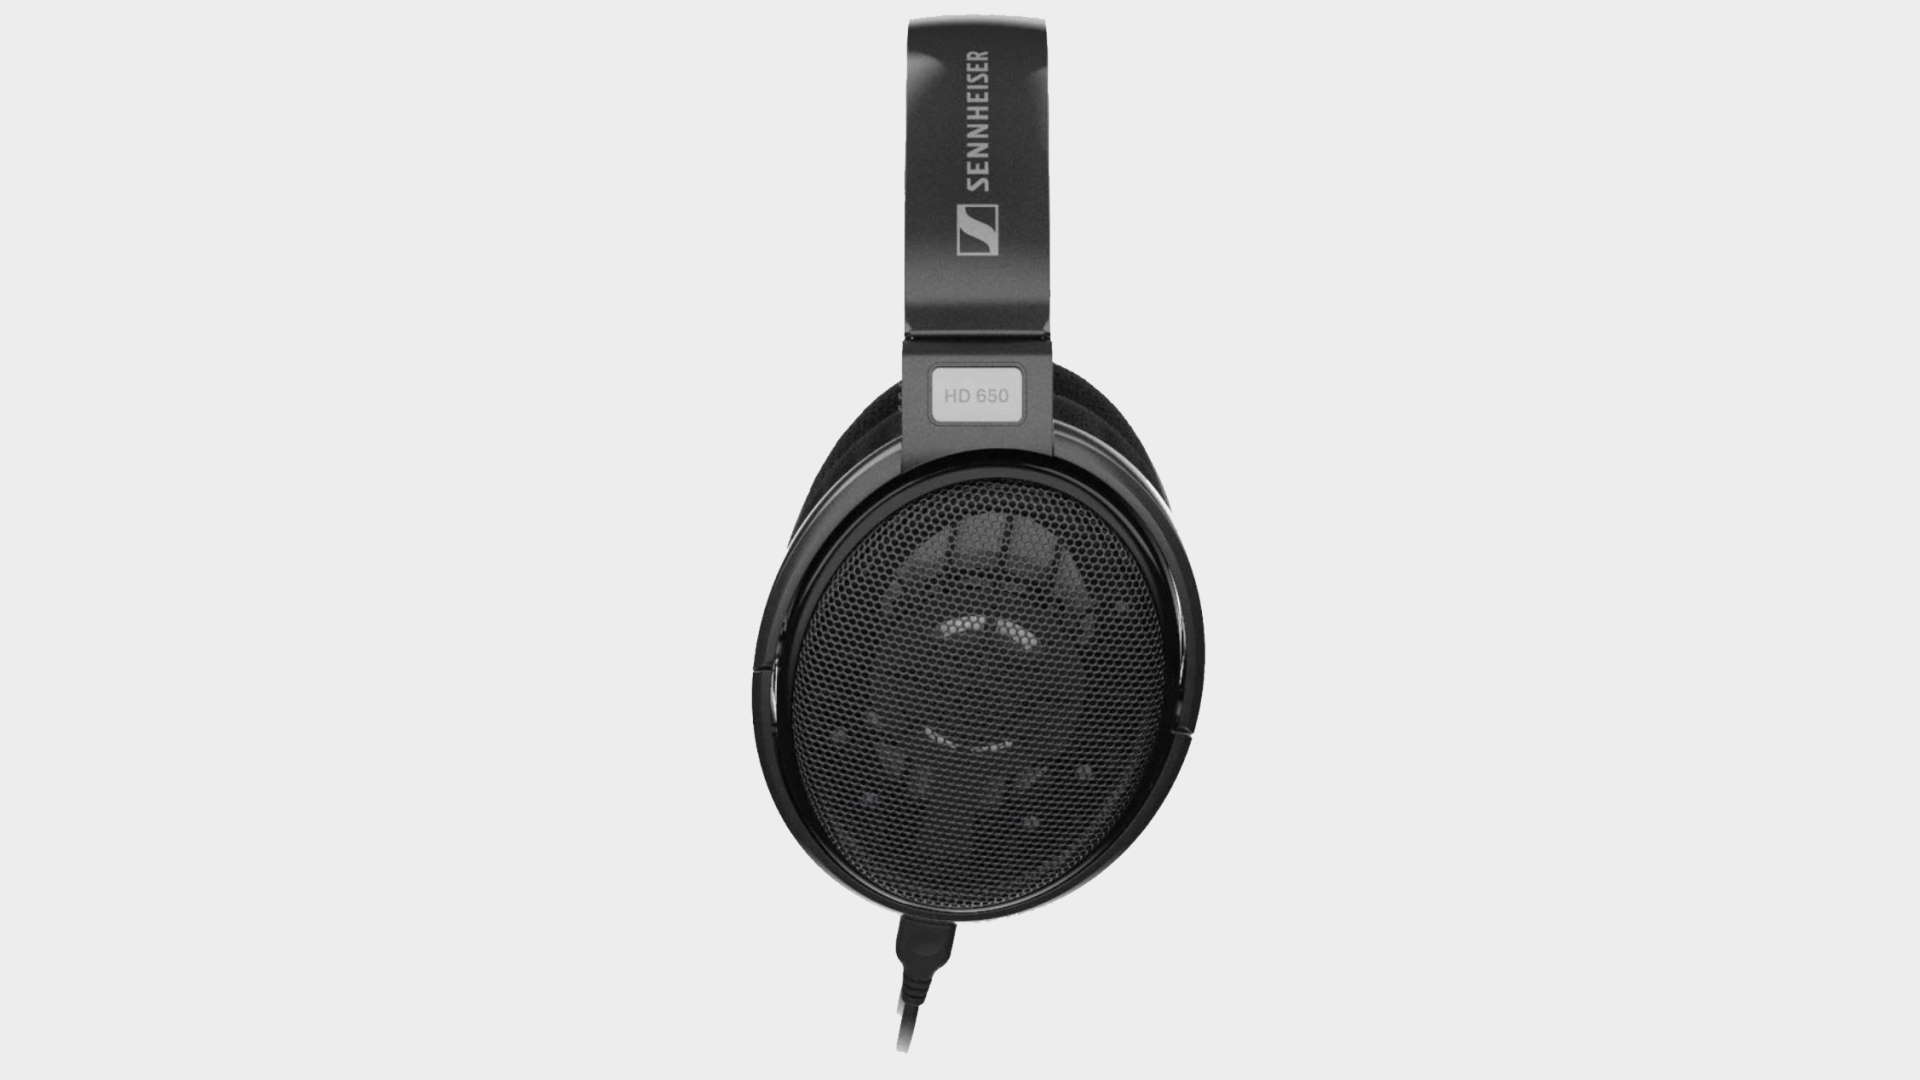 Sennheiser HD650 headphones on a blank background